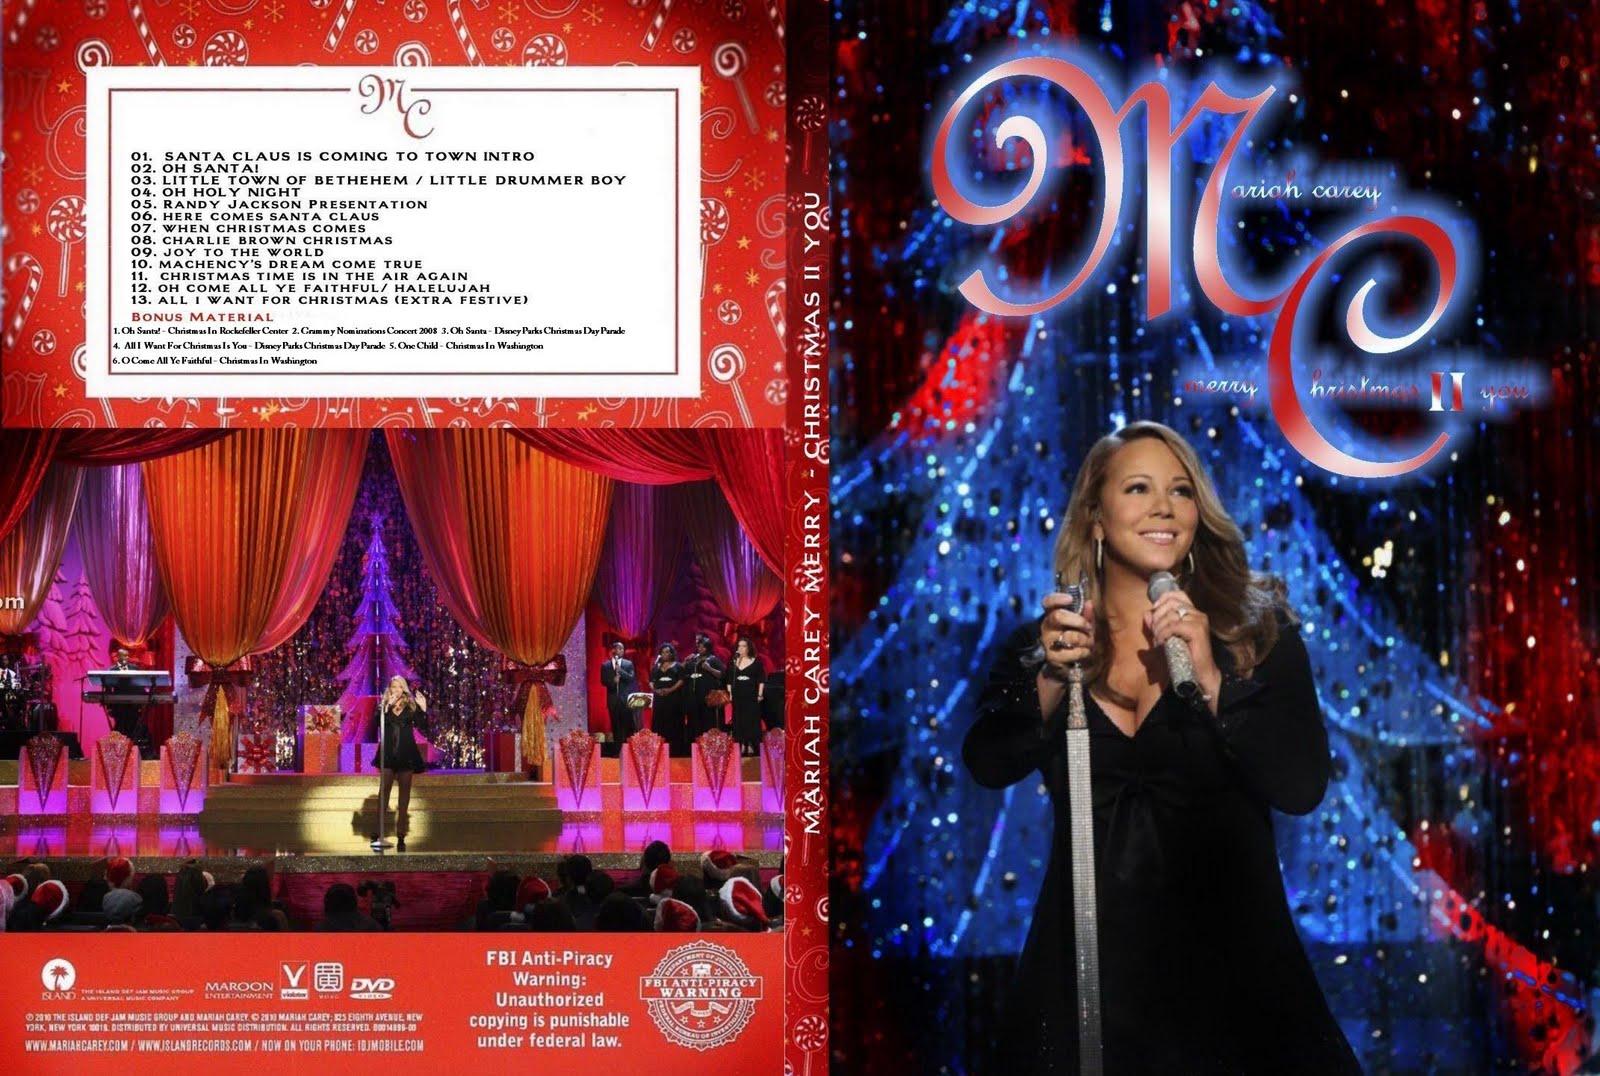 http://4.bp.blogspot.com/-CM5zaPxrnxM/Tr3CSTffIFI/AAAAAAAAAro/deHOi1Yg2oY/s1600/%255BAllCDCovers%255D_mariah_carey_merry_christmas_ii_you_abc_special_presentantion_2010_custom_dvd-front.jpg